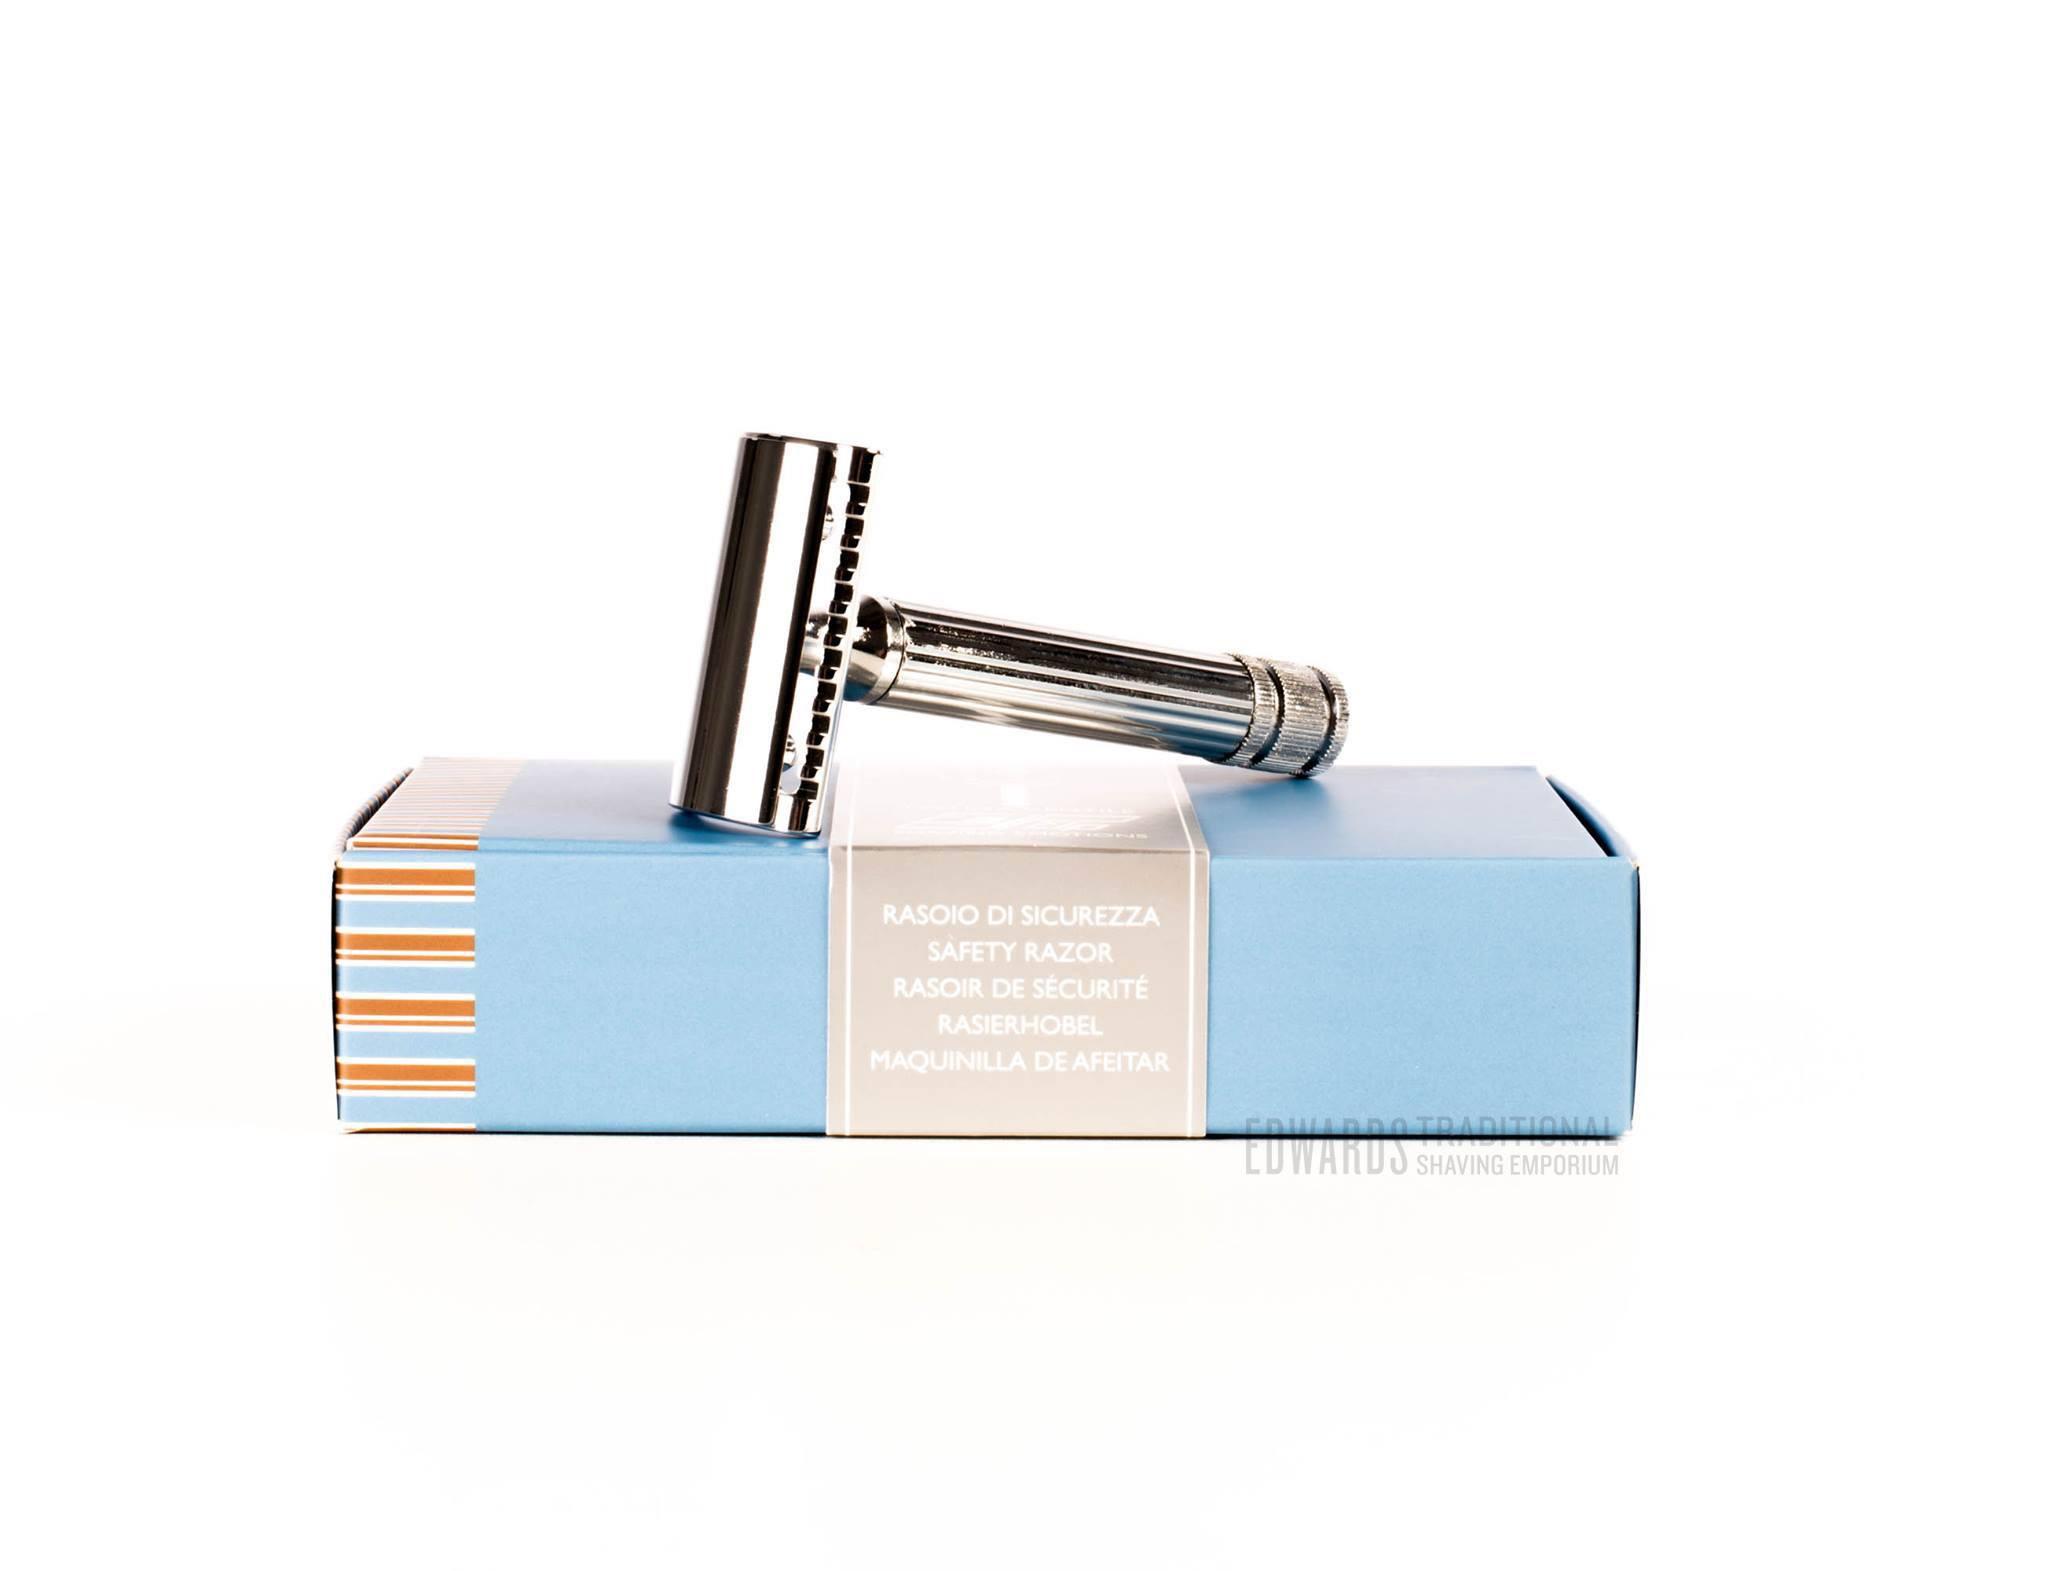 Fatip gentile chrome safety razor